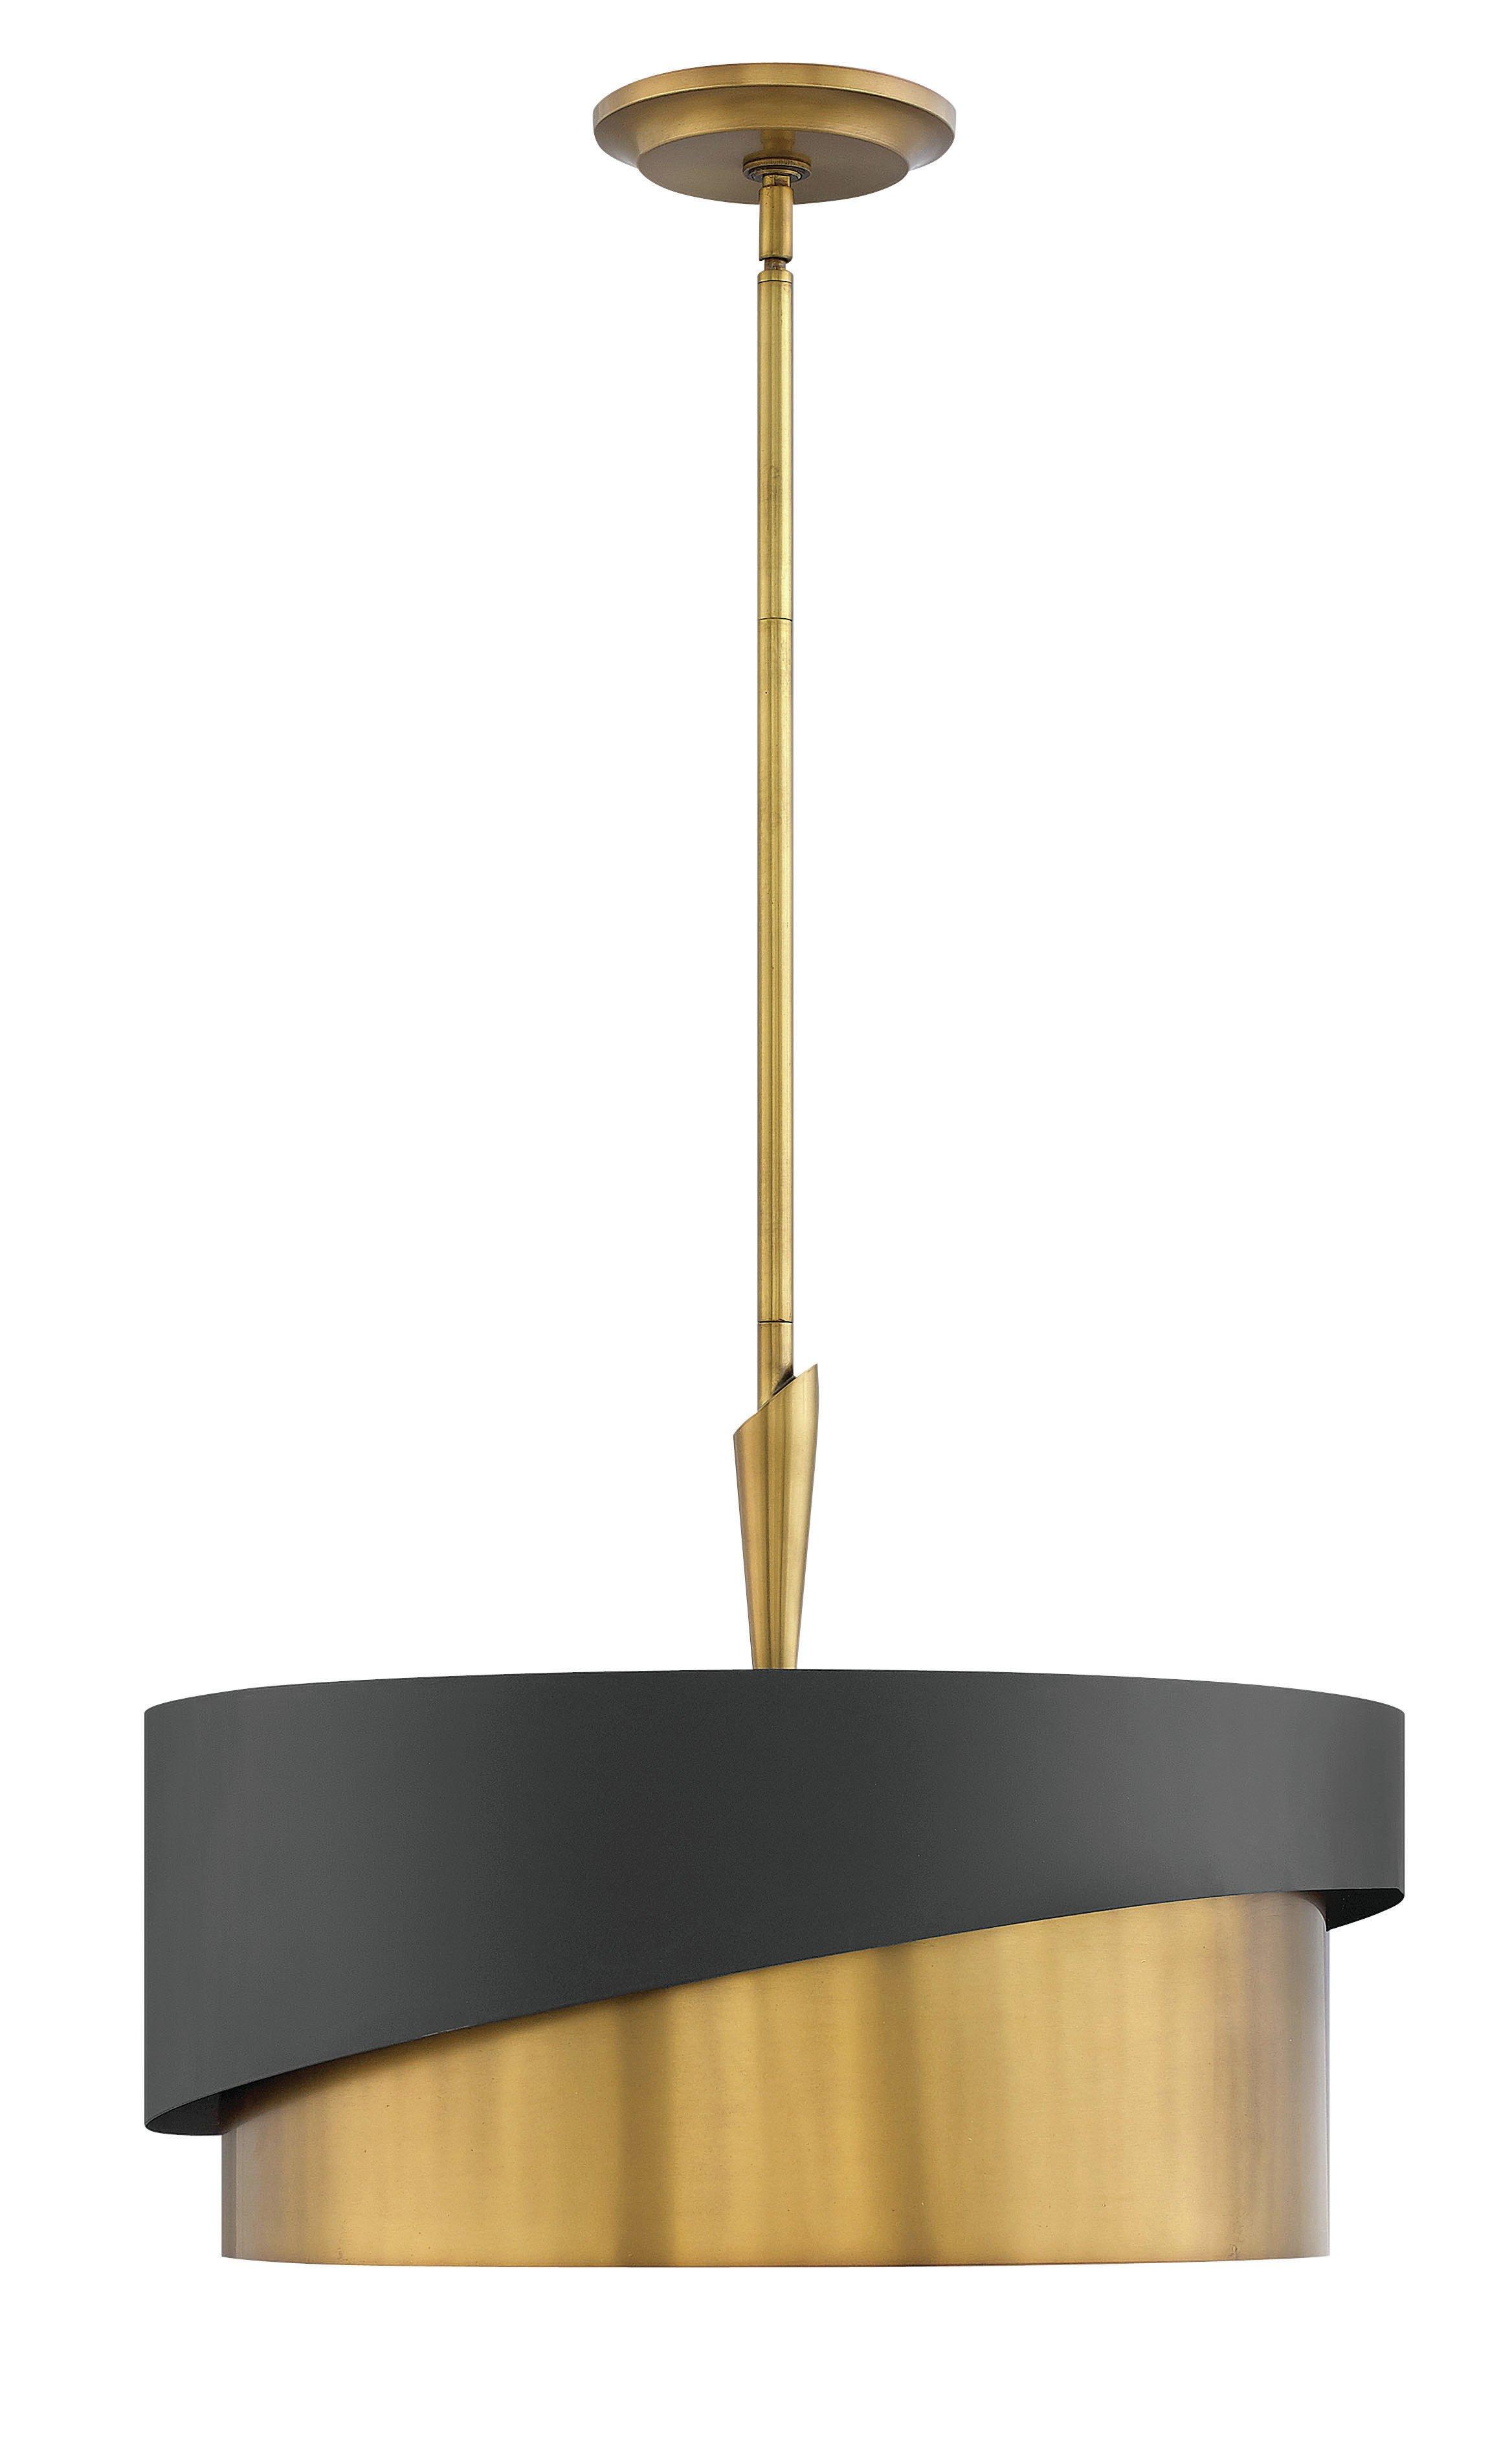 Fashionable Breithaup 7 Light Drum Chandeliers Regarding Retzlaff 3 Light Drum Chandelier (View 10 of 20)